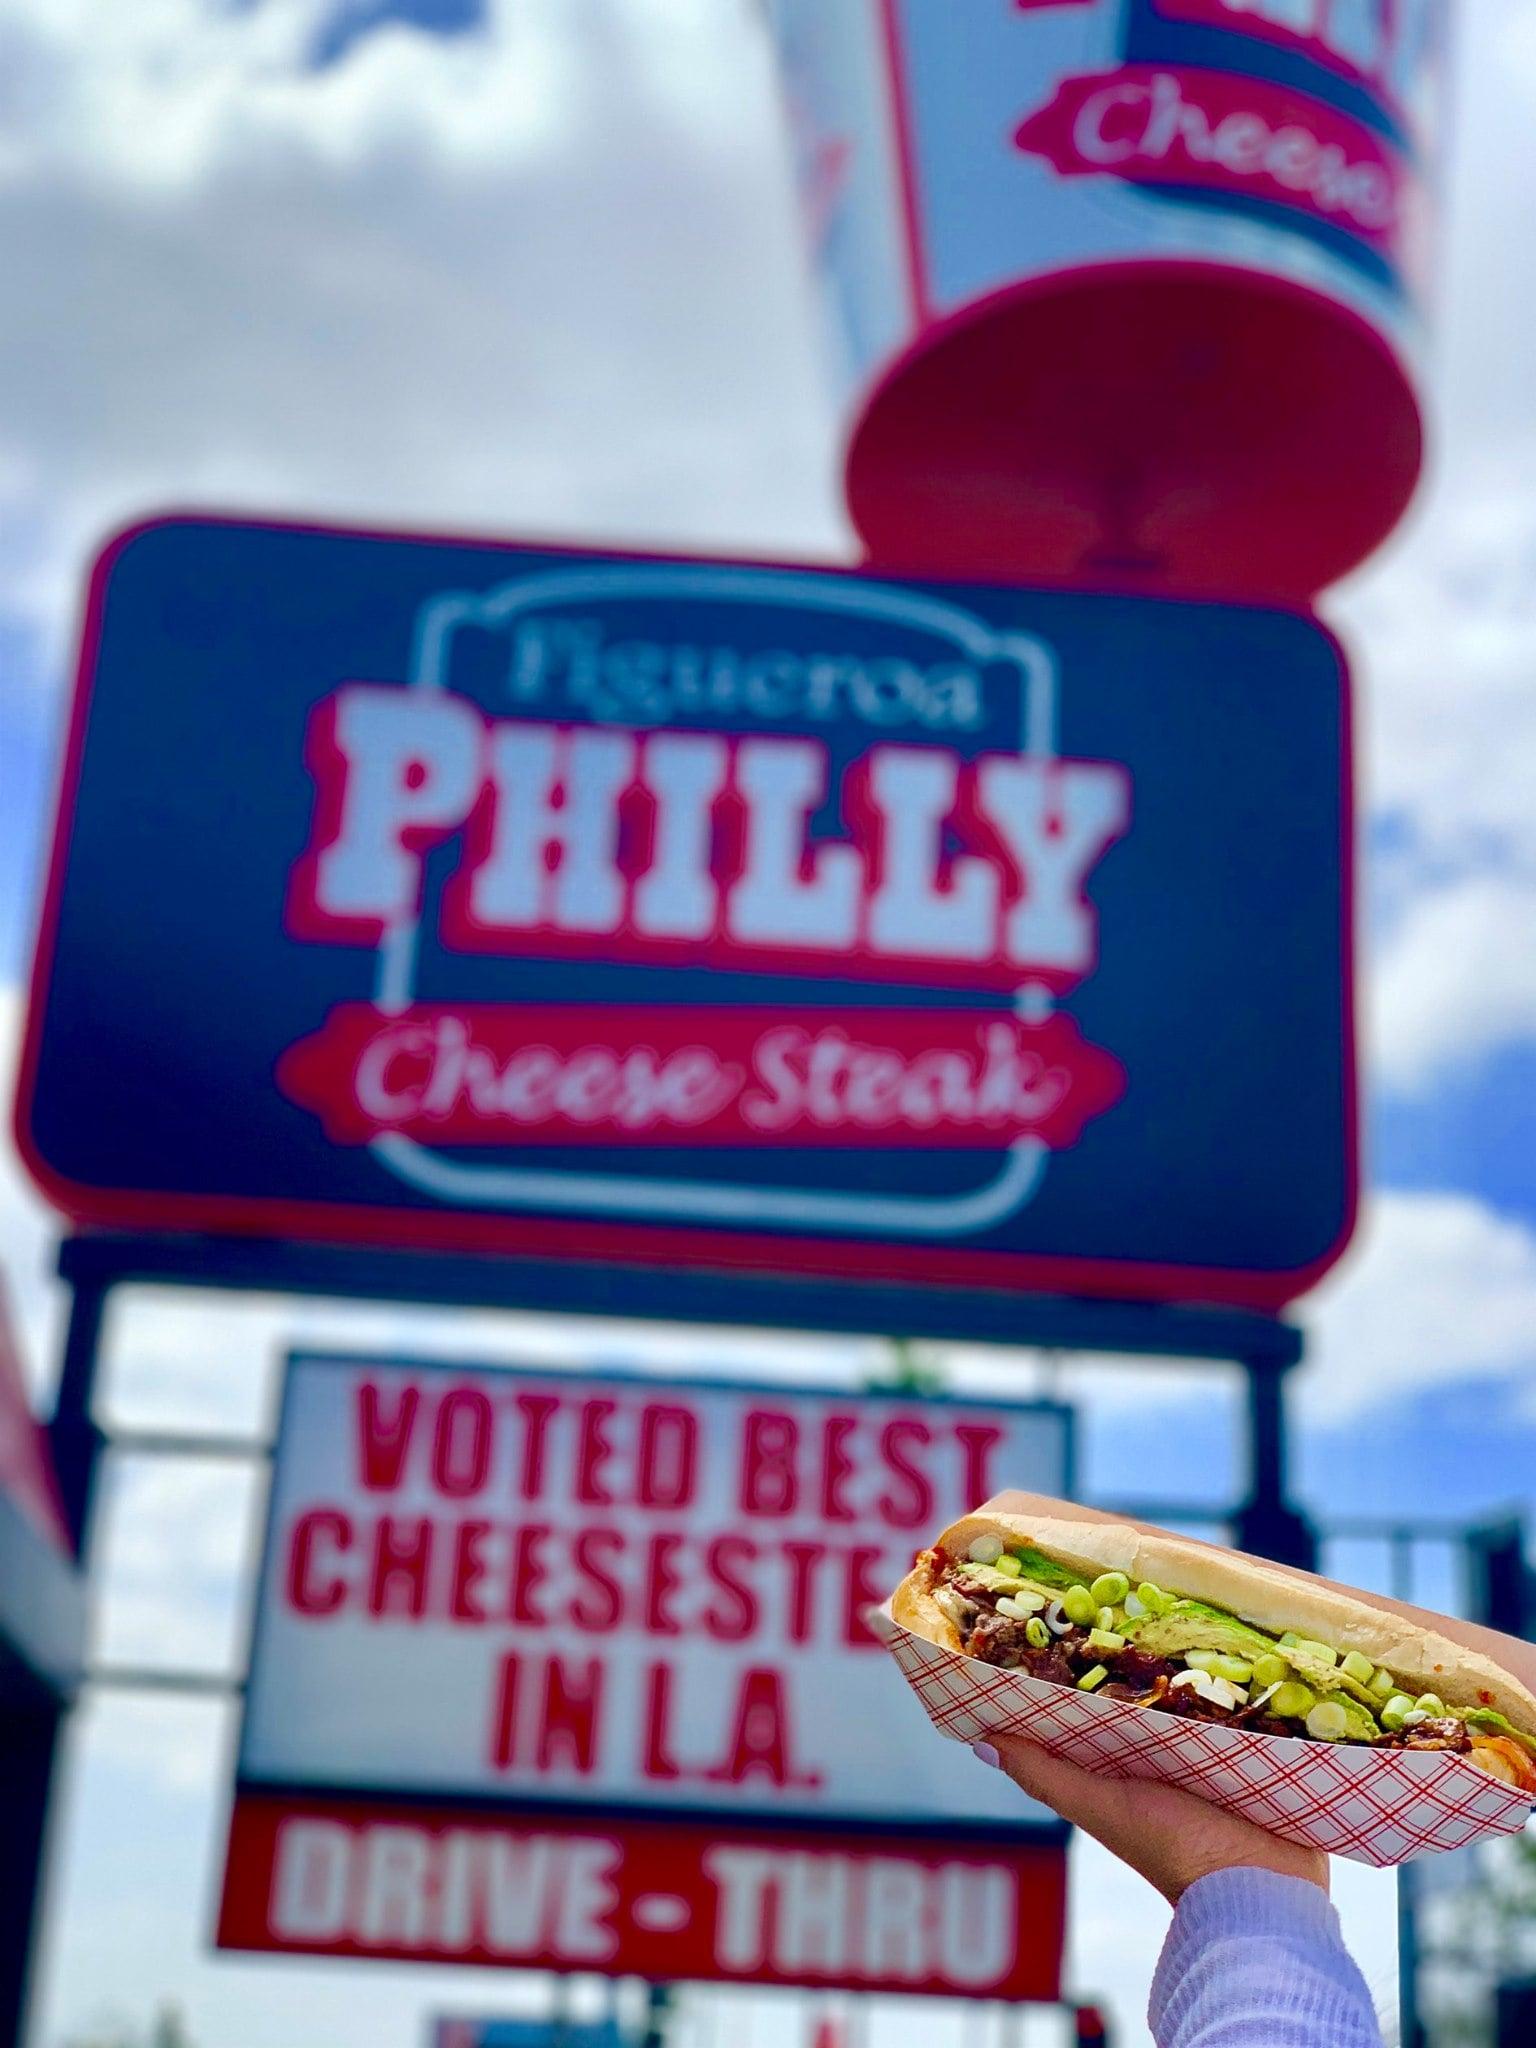 Best cheesesteak Los Angeles